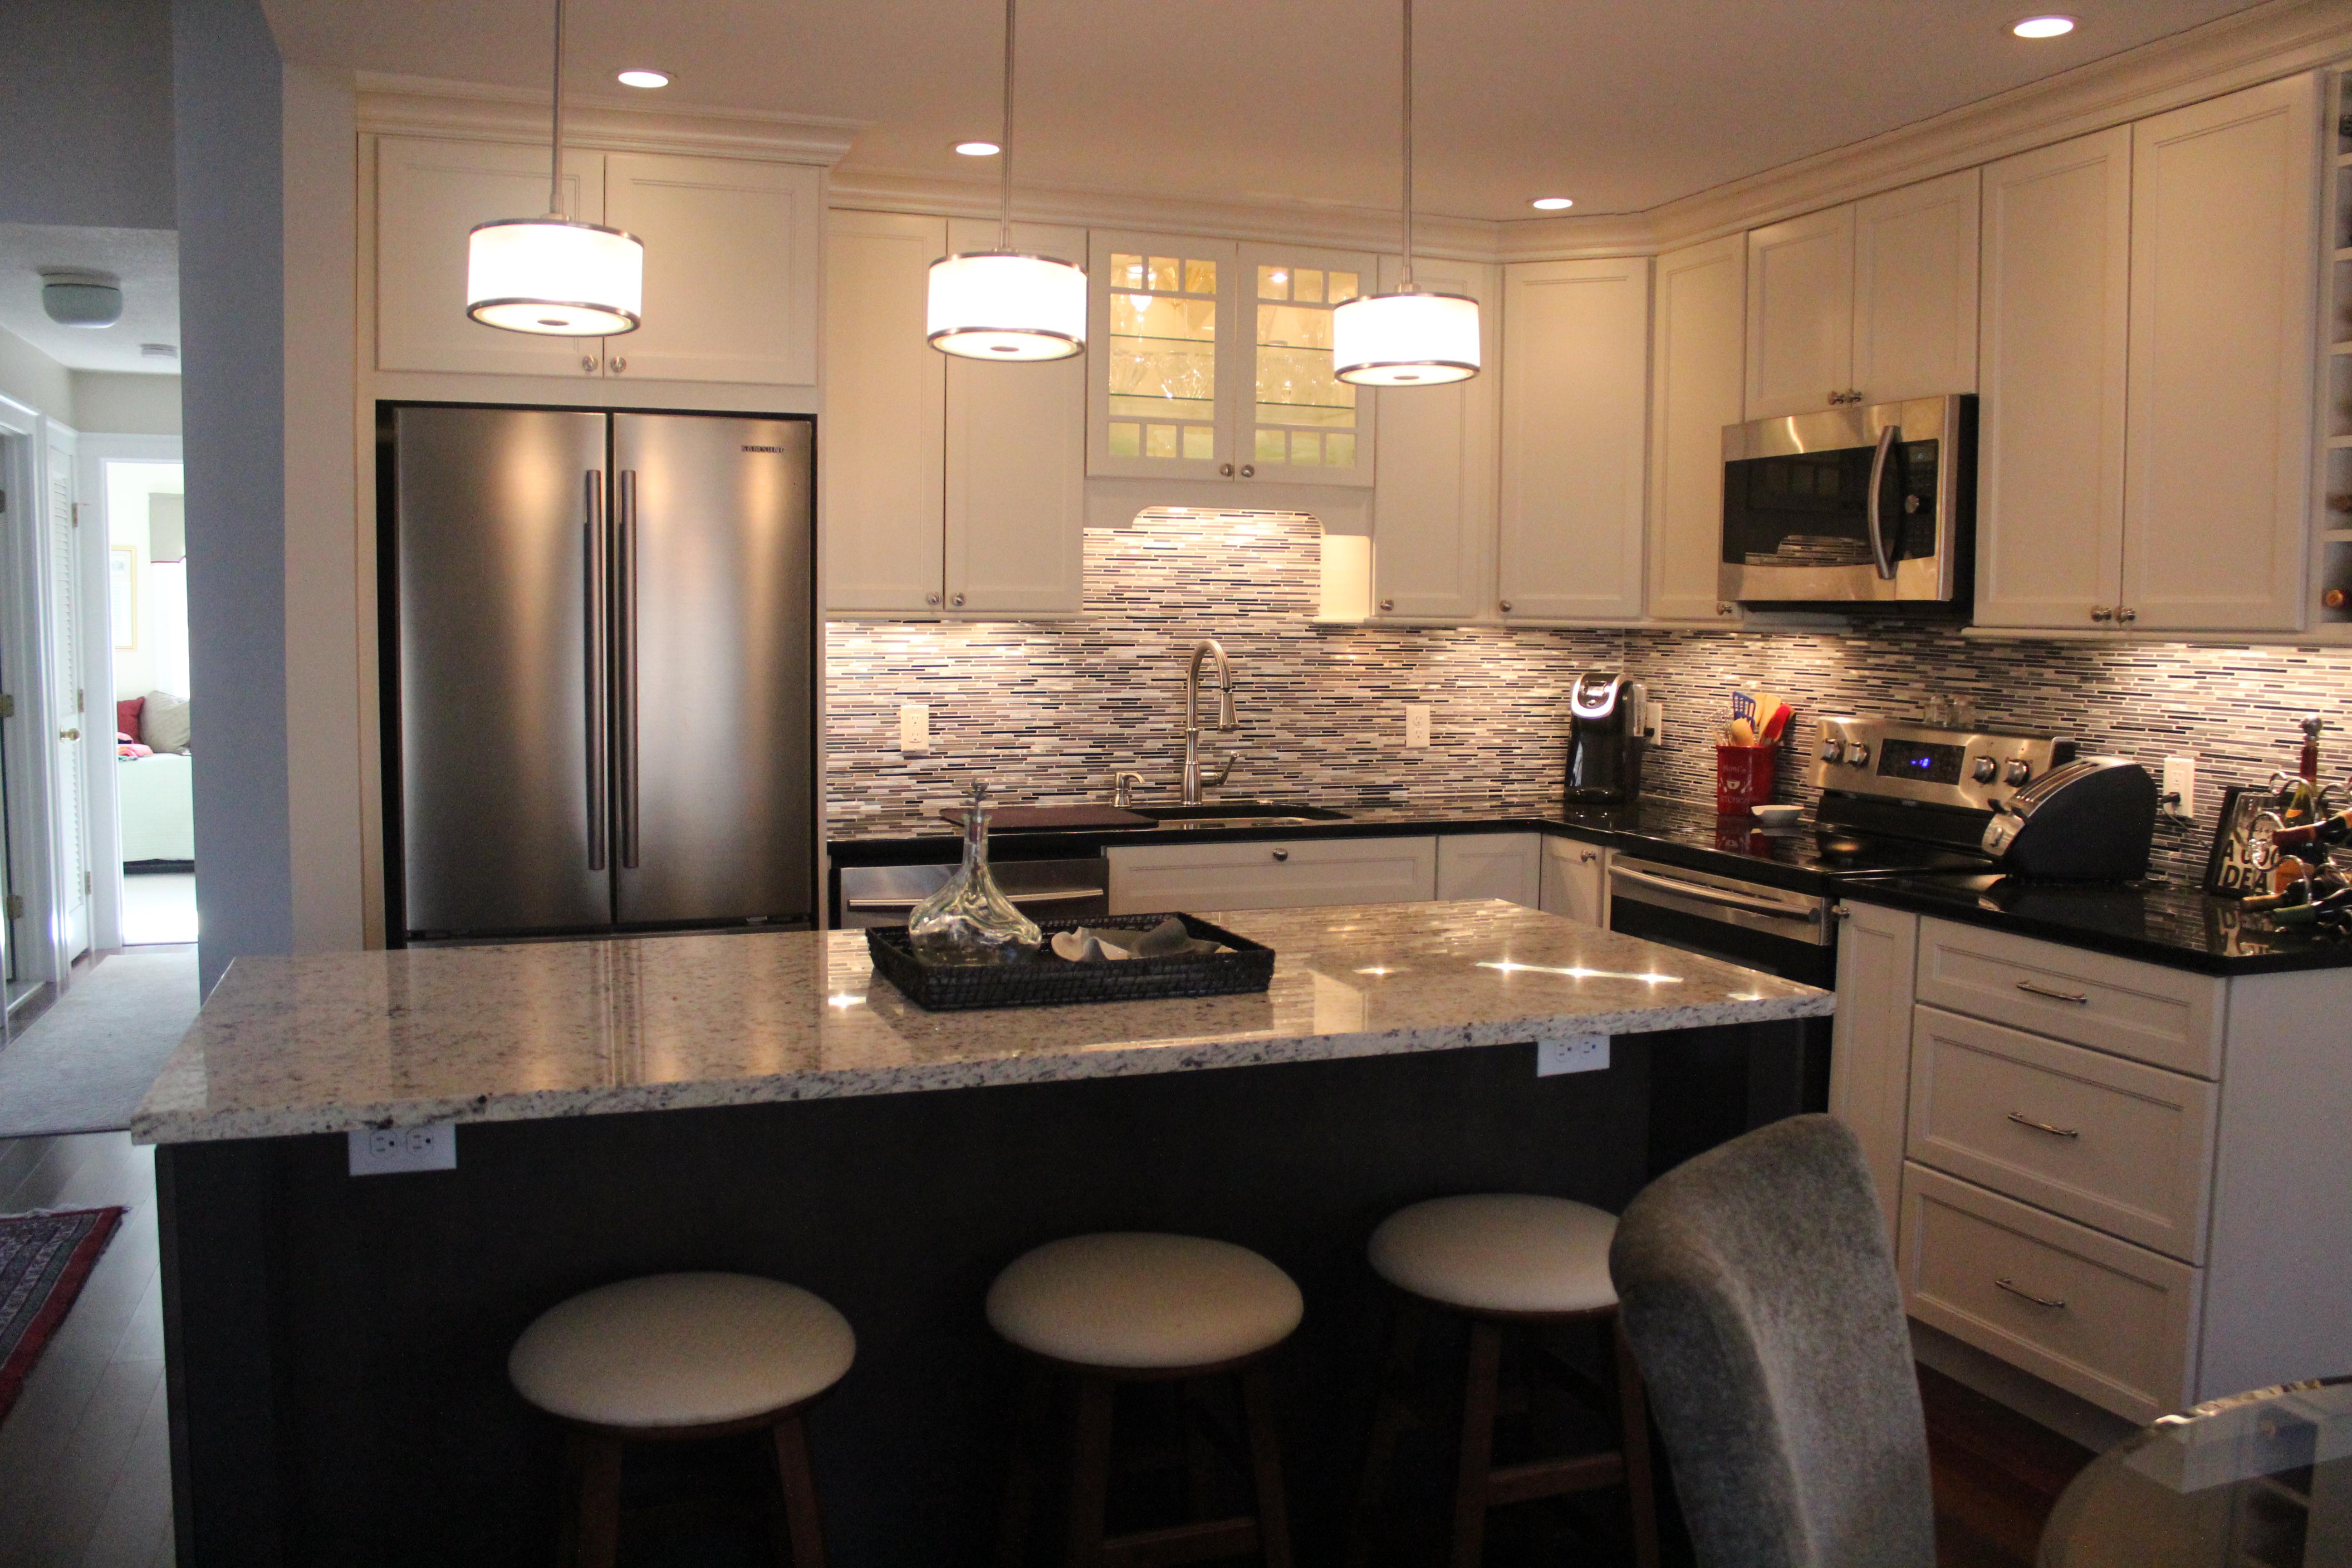 Open spaces a condominium kitchen remodel – Long Custom Carpentry